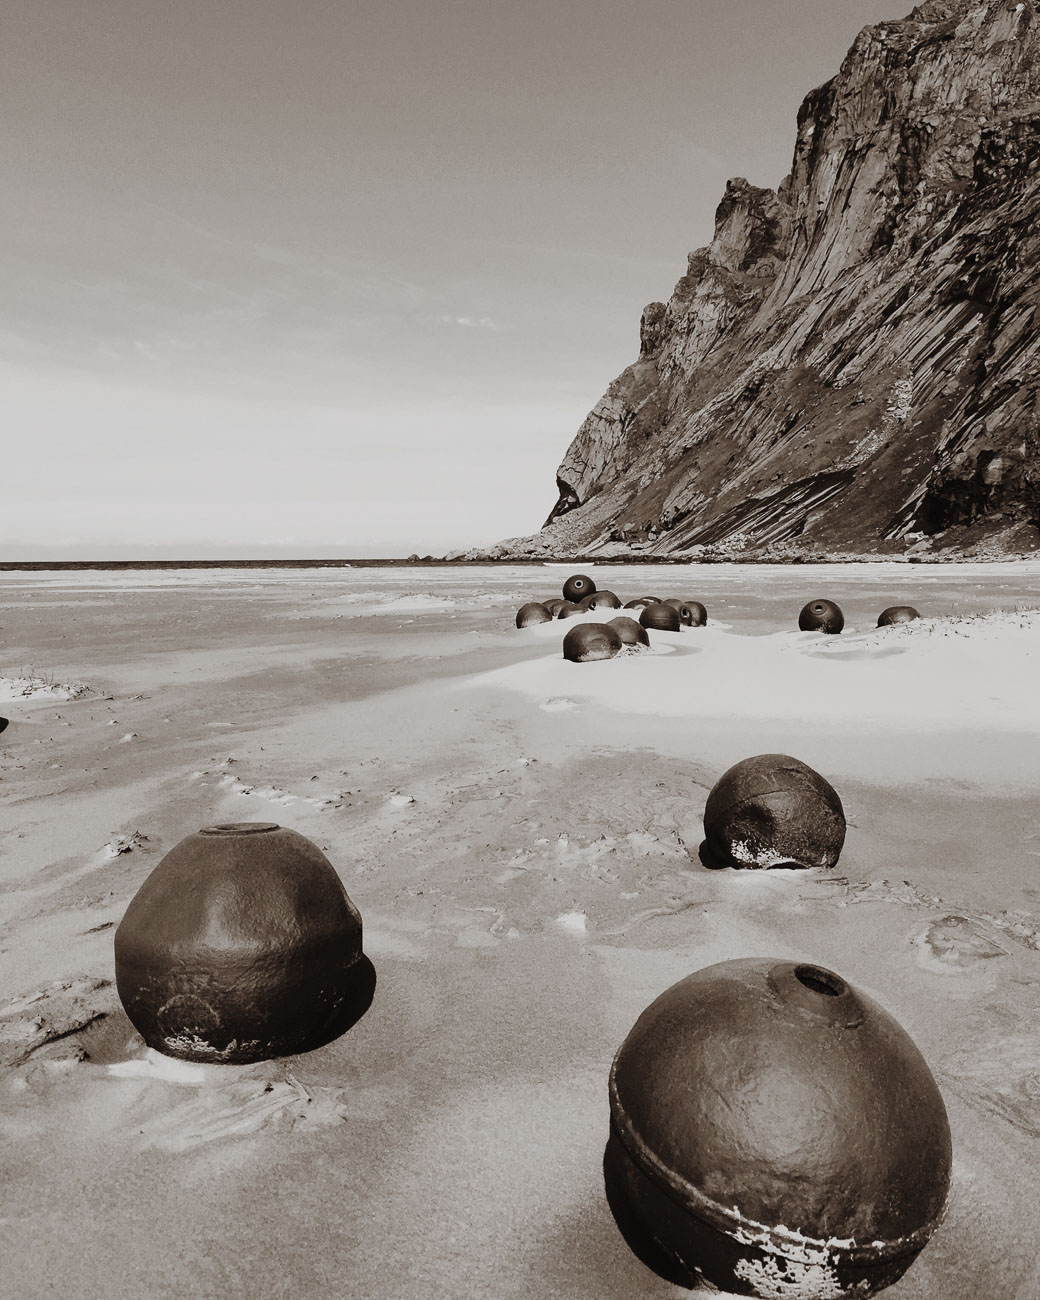 Bunes beach - Noruega - JESUS RODRIGUEZ, FOTOGRAFIA DE NATURALEZA